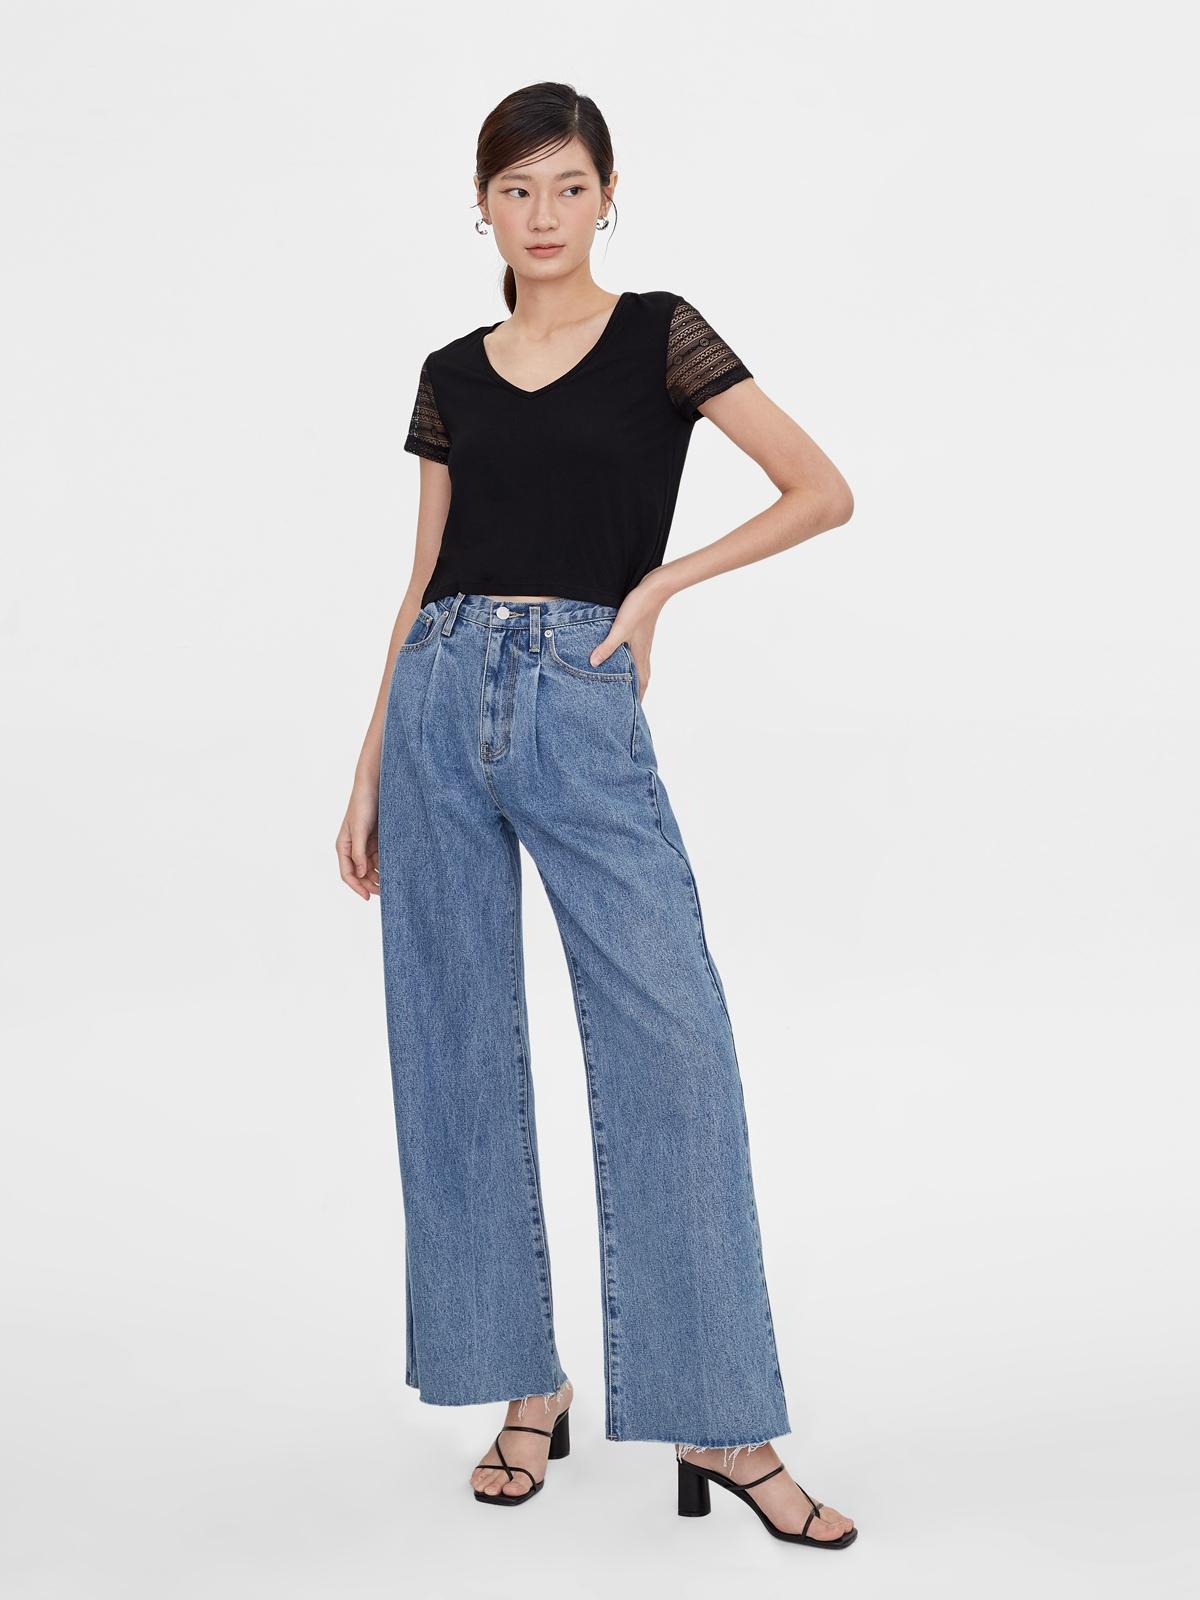 Lace Short Sleeves Tees Black